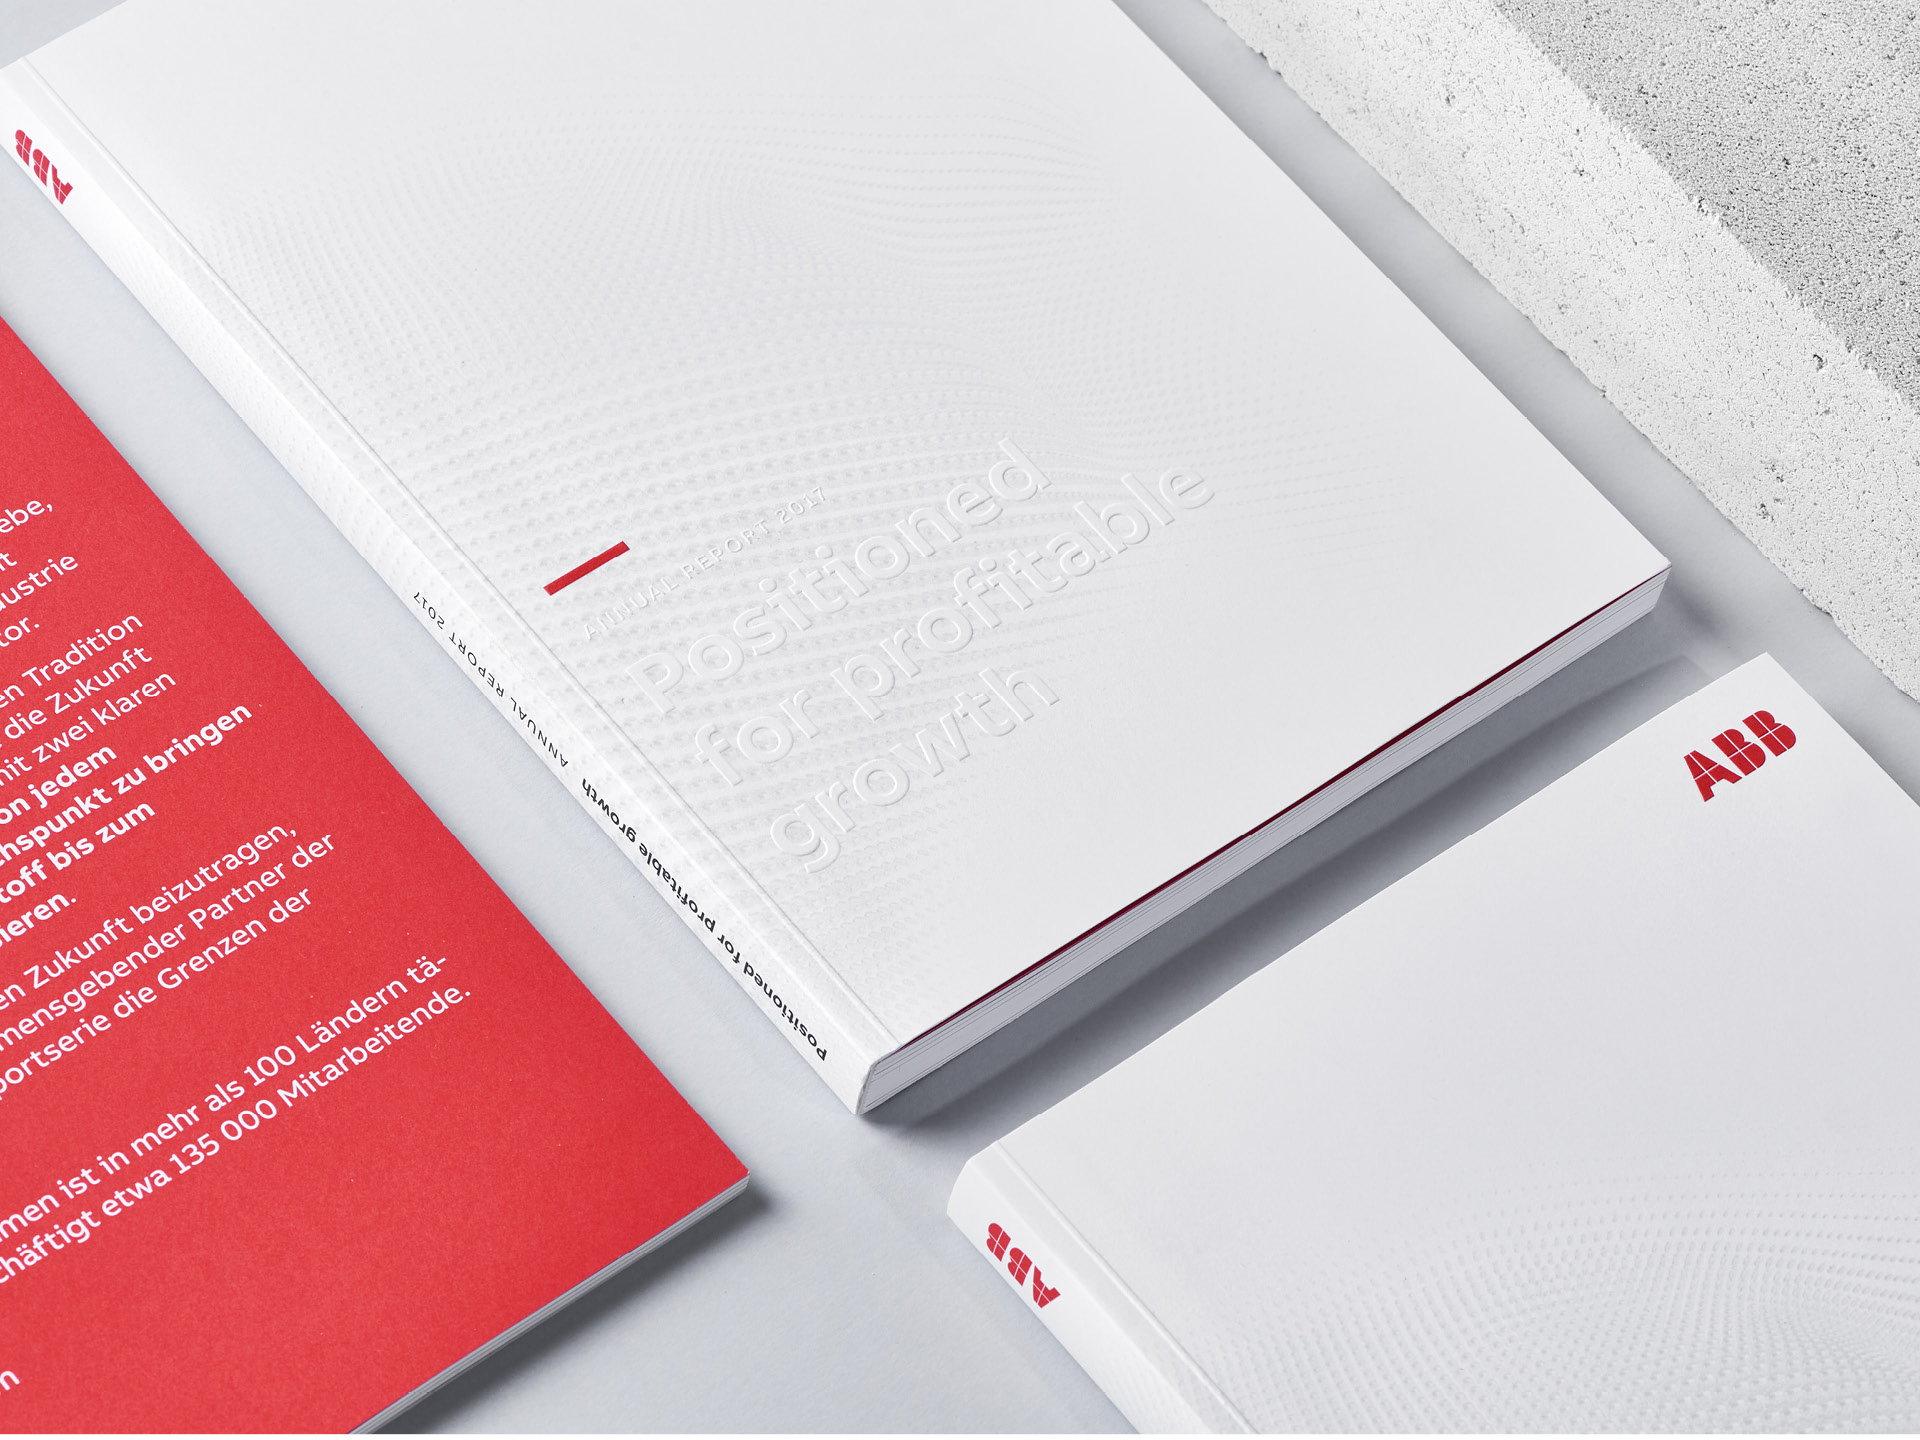 ABB Annual Report